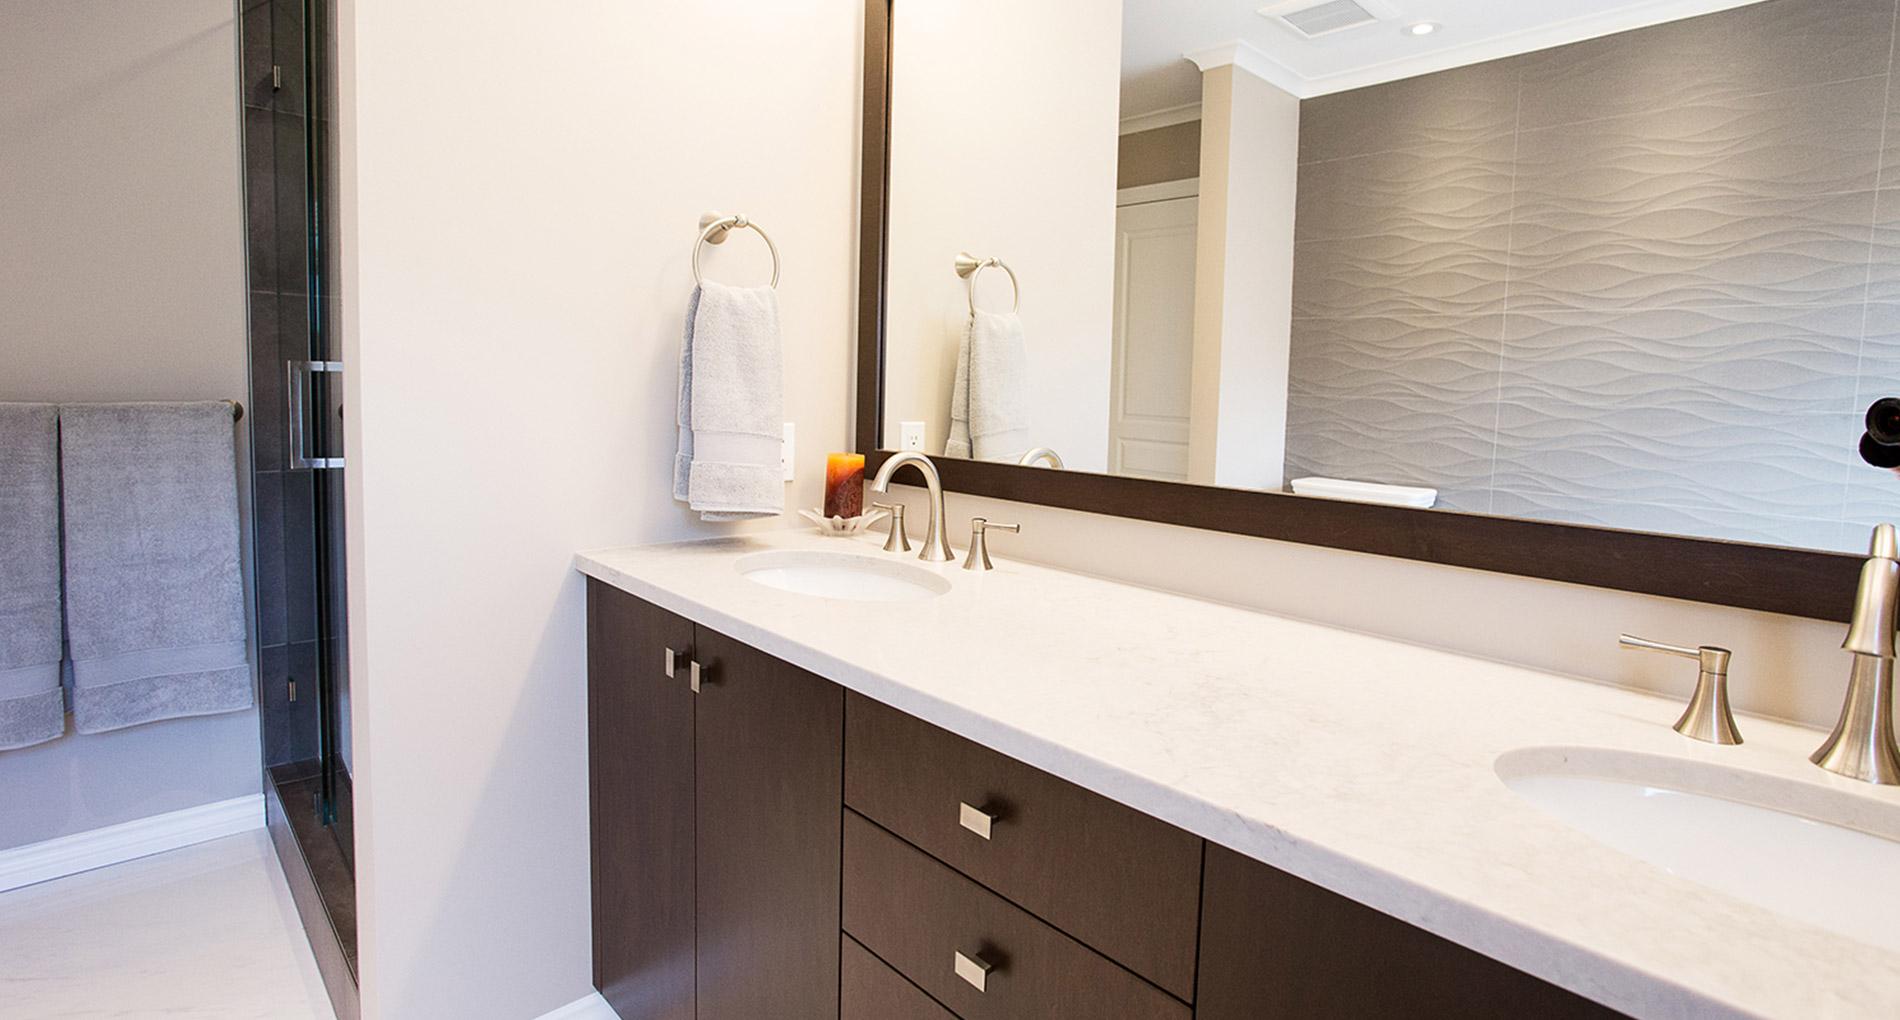 Commodore Bathroom Renovation